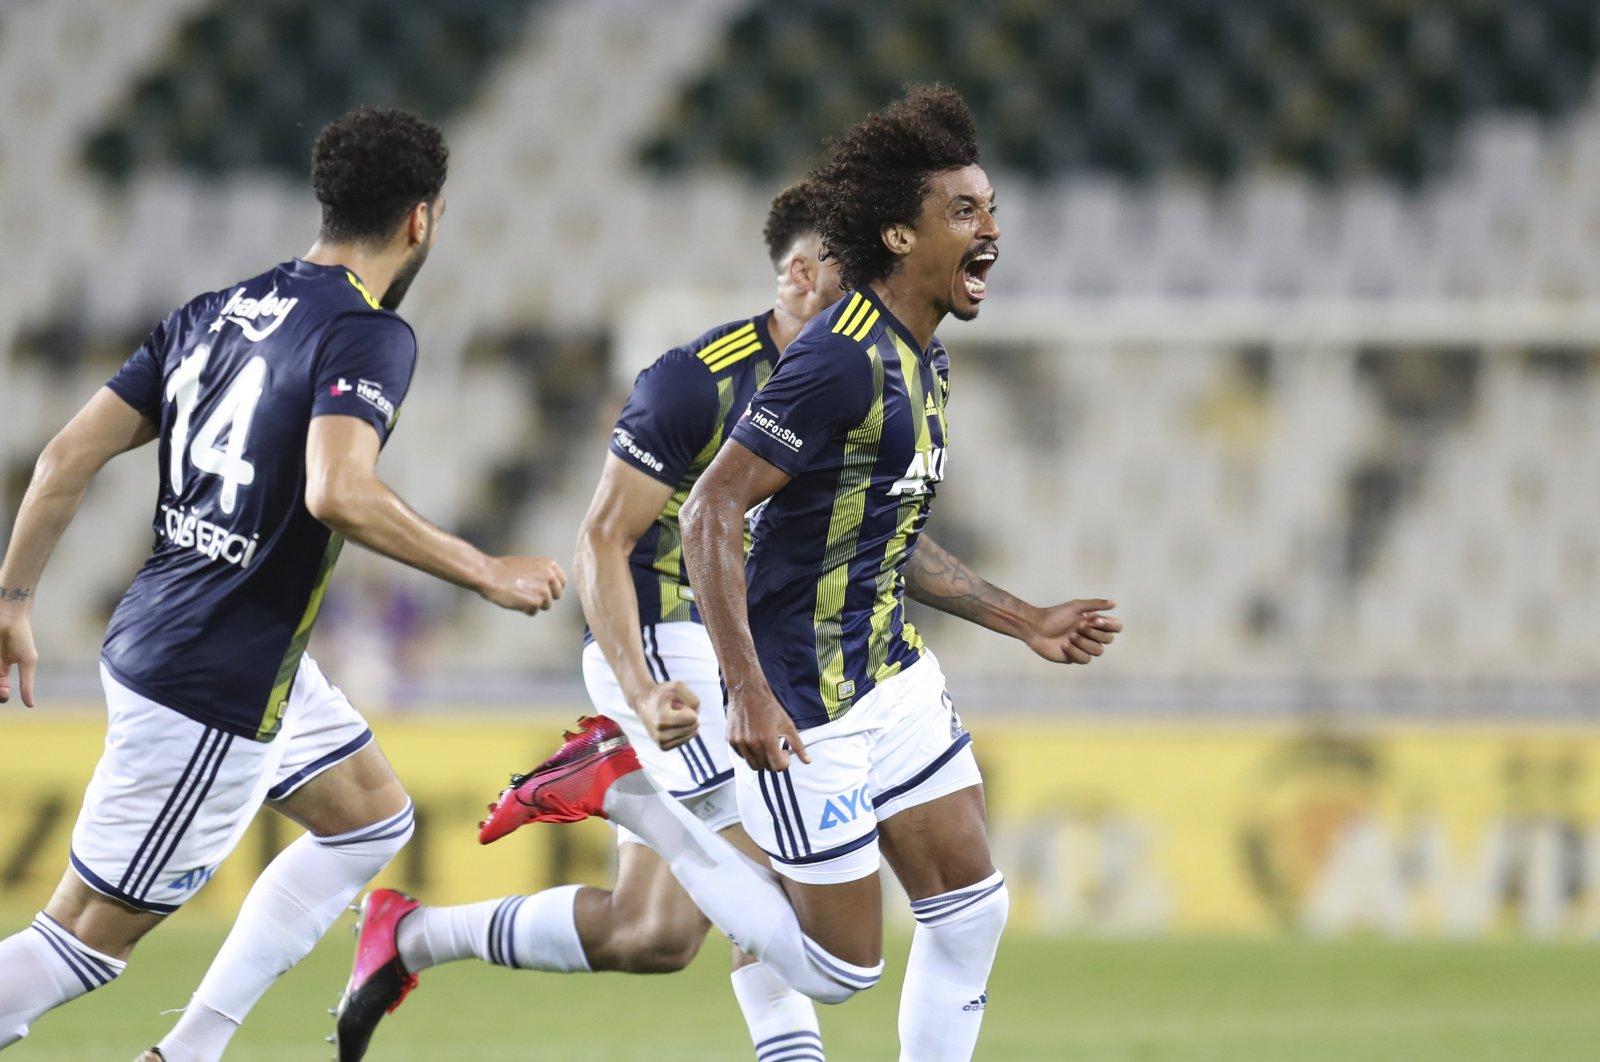 Fener's Jailson Marques celebrates scoring a goal against Kayseri in Istanbul, Turkey, June 13, 2020. (AA Photo)